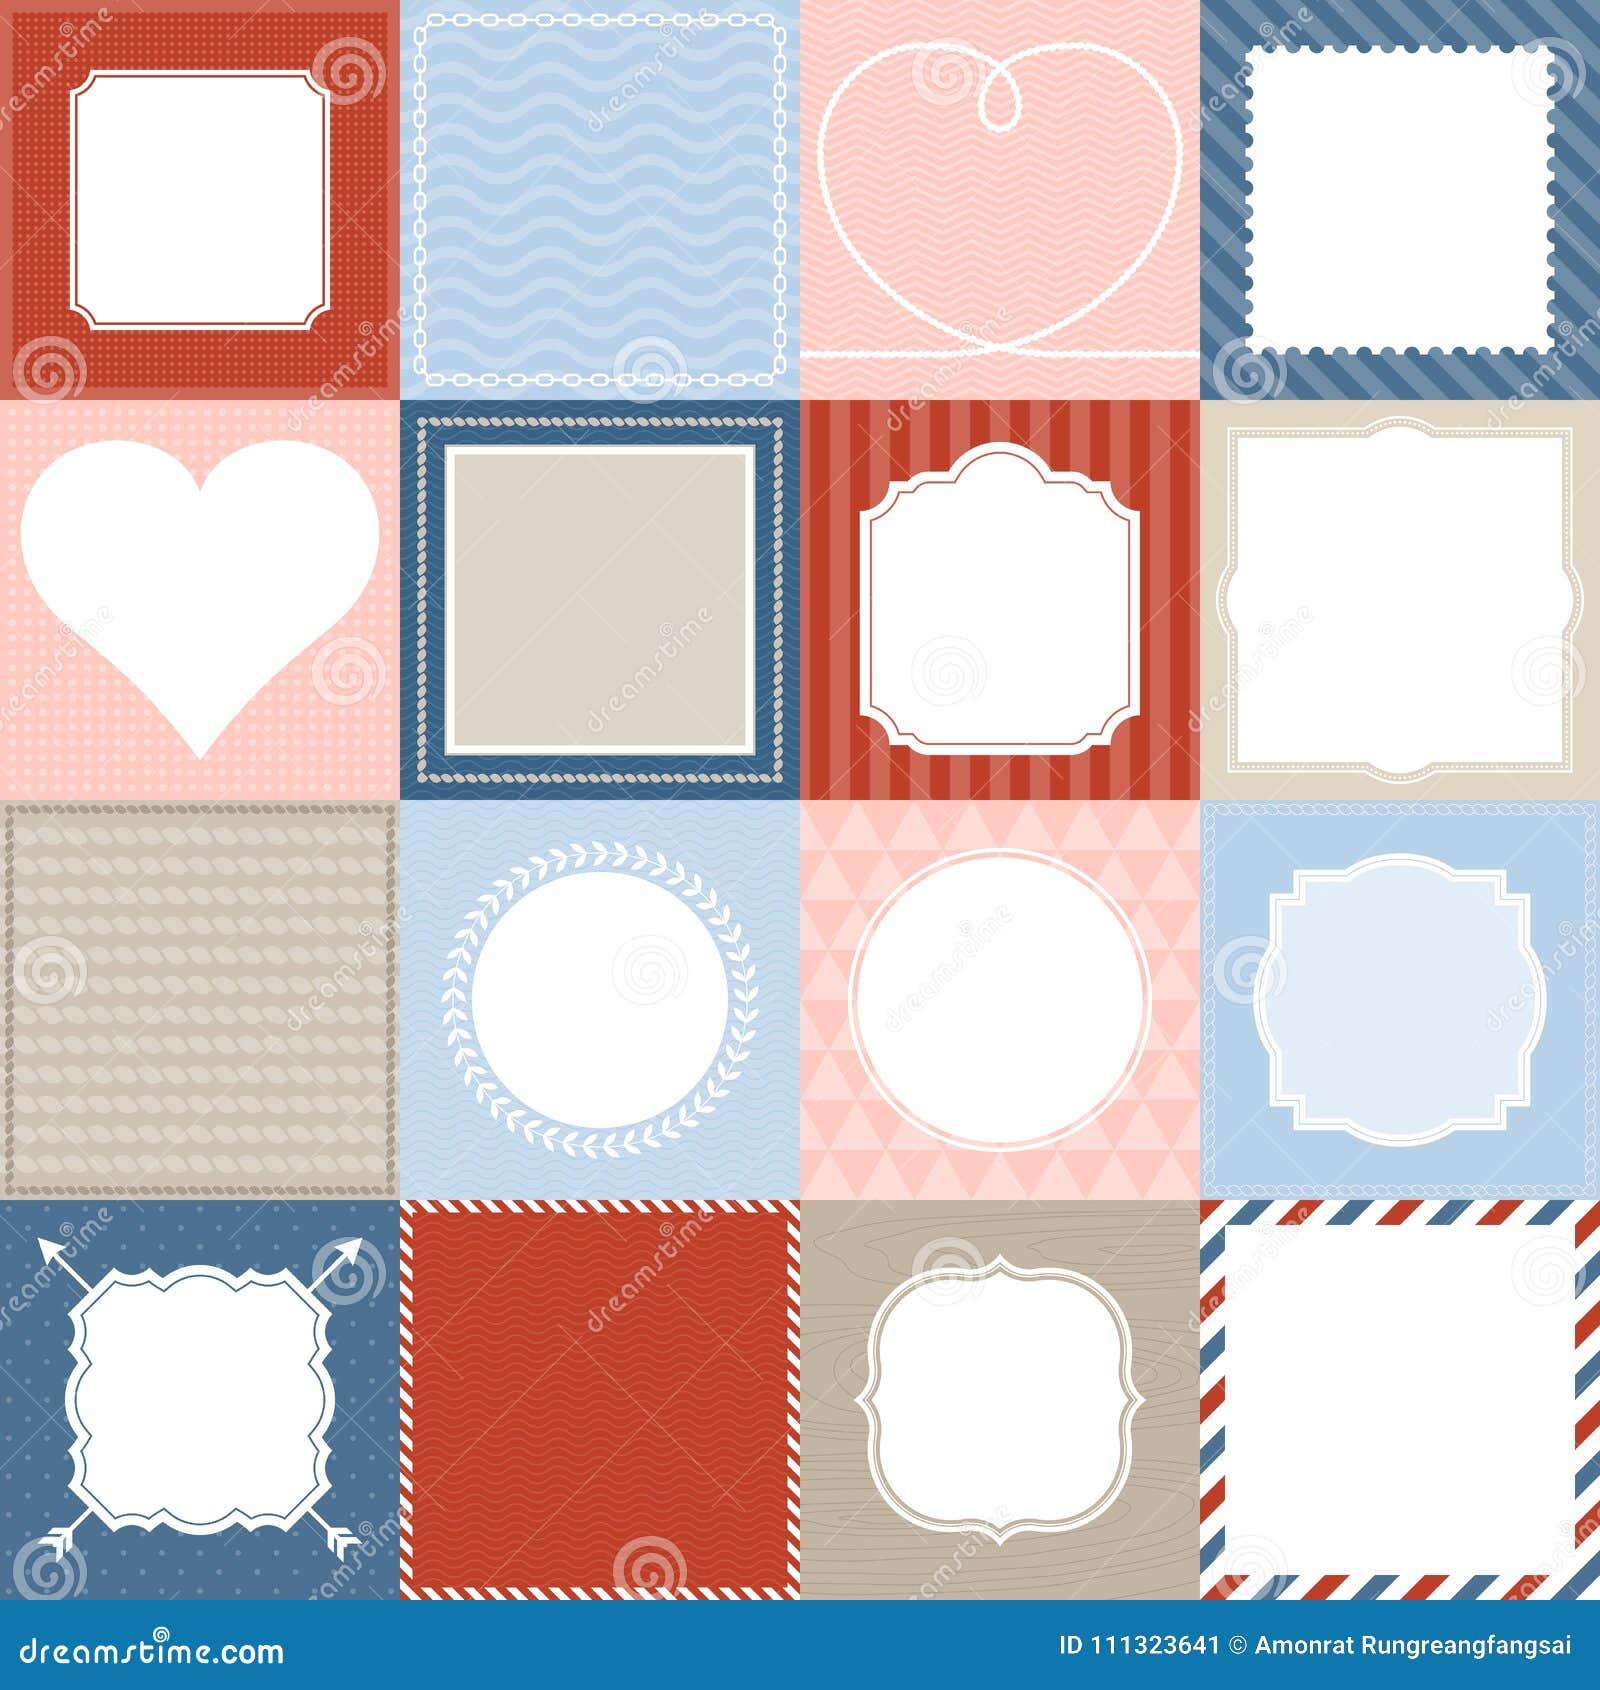 Ashampoo home designer pro free download 4 tutorial 2015 chief.